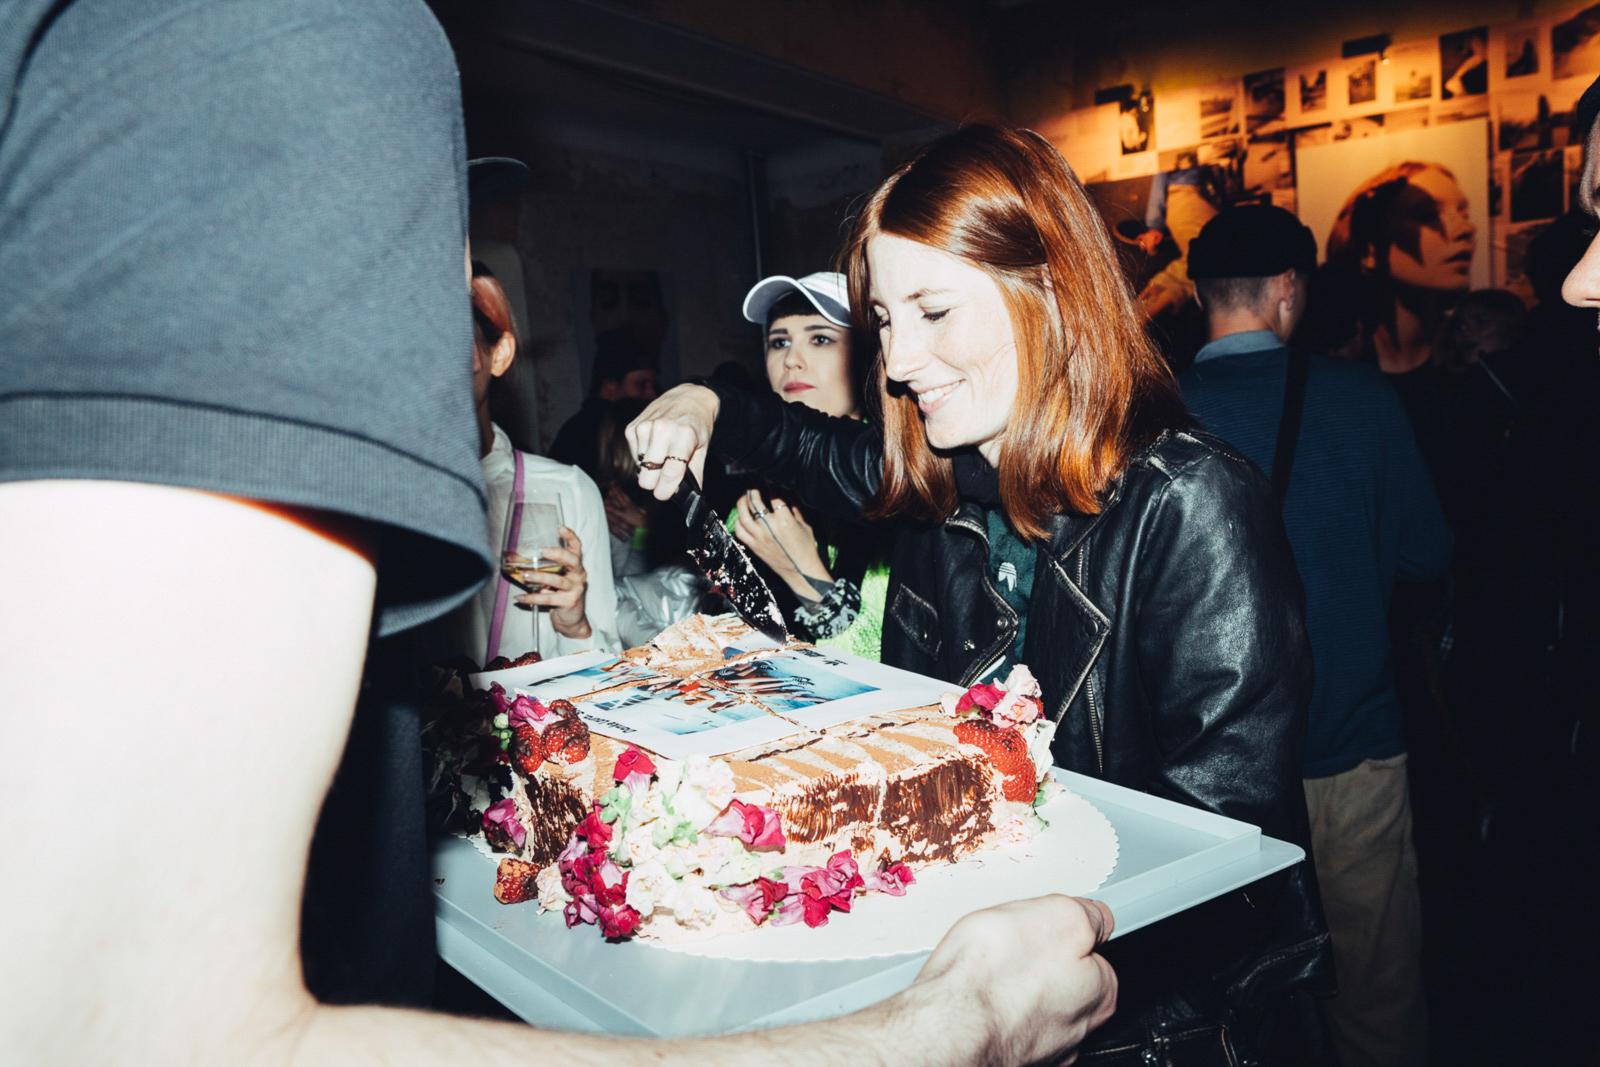 2019_RebeccaRuetten_Web_Girlsareawesome-10.jpg